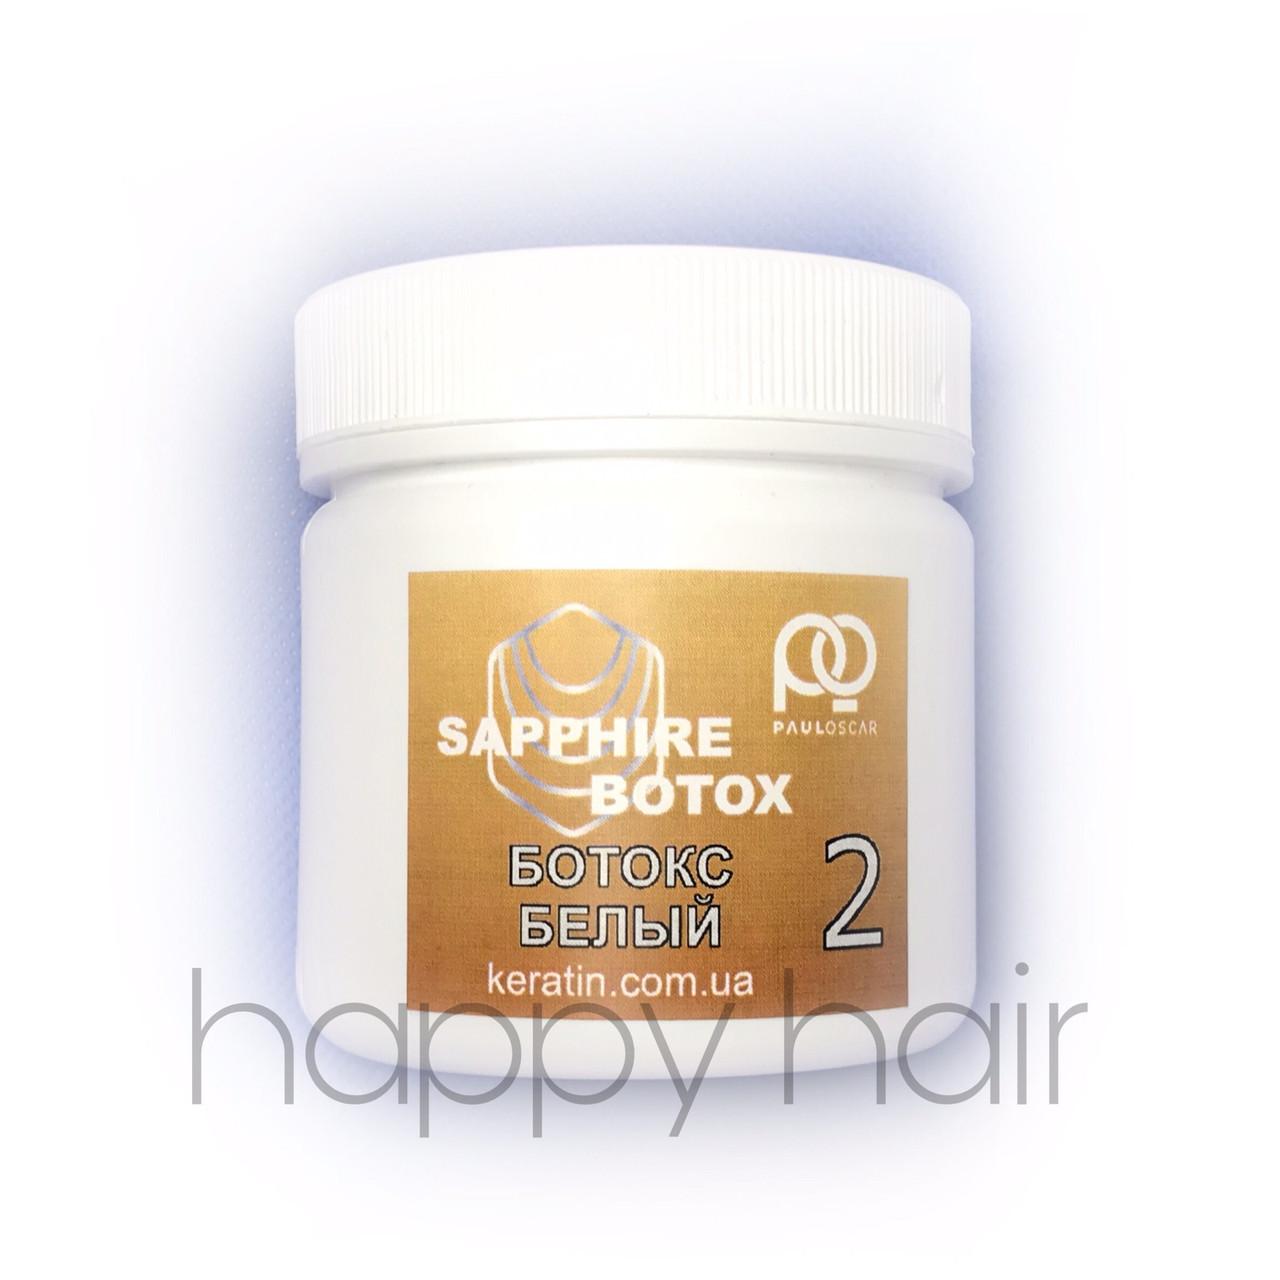 Paul Oscar Sapphire btox White ботекс для волос 200 г